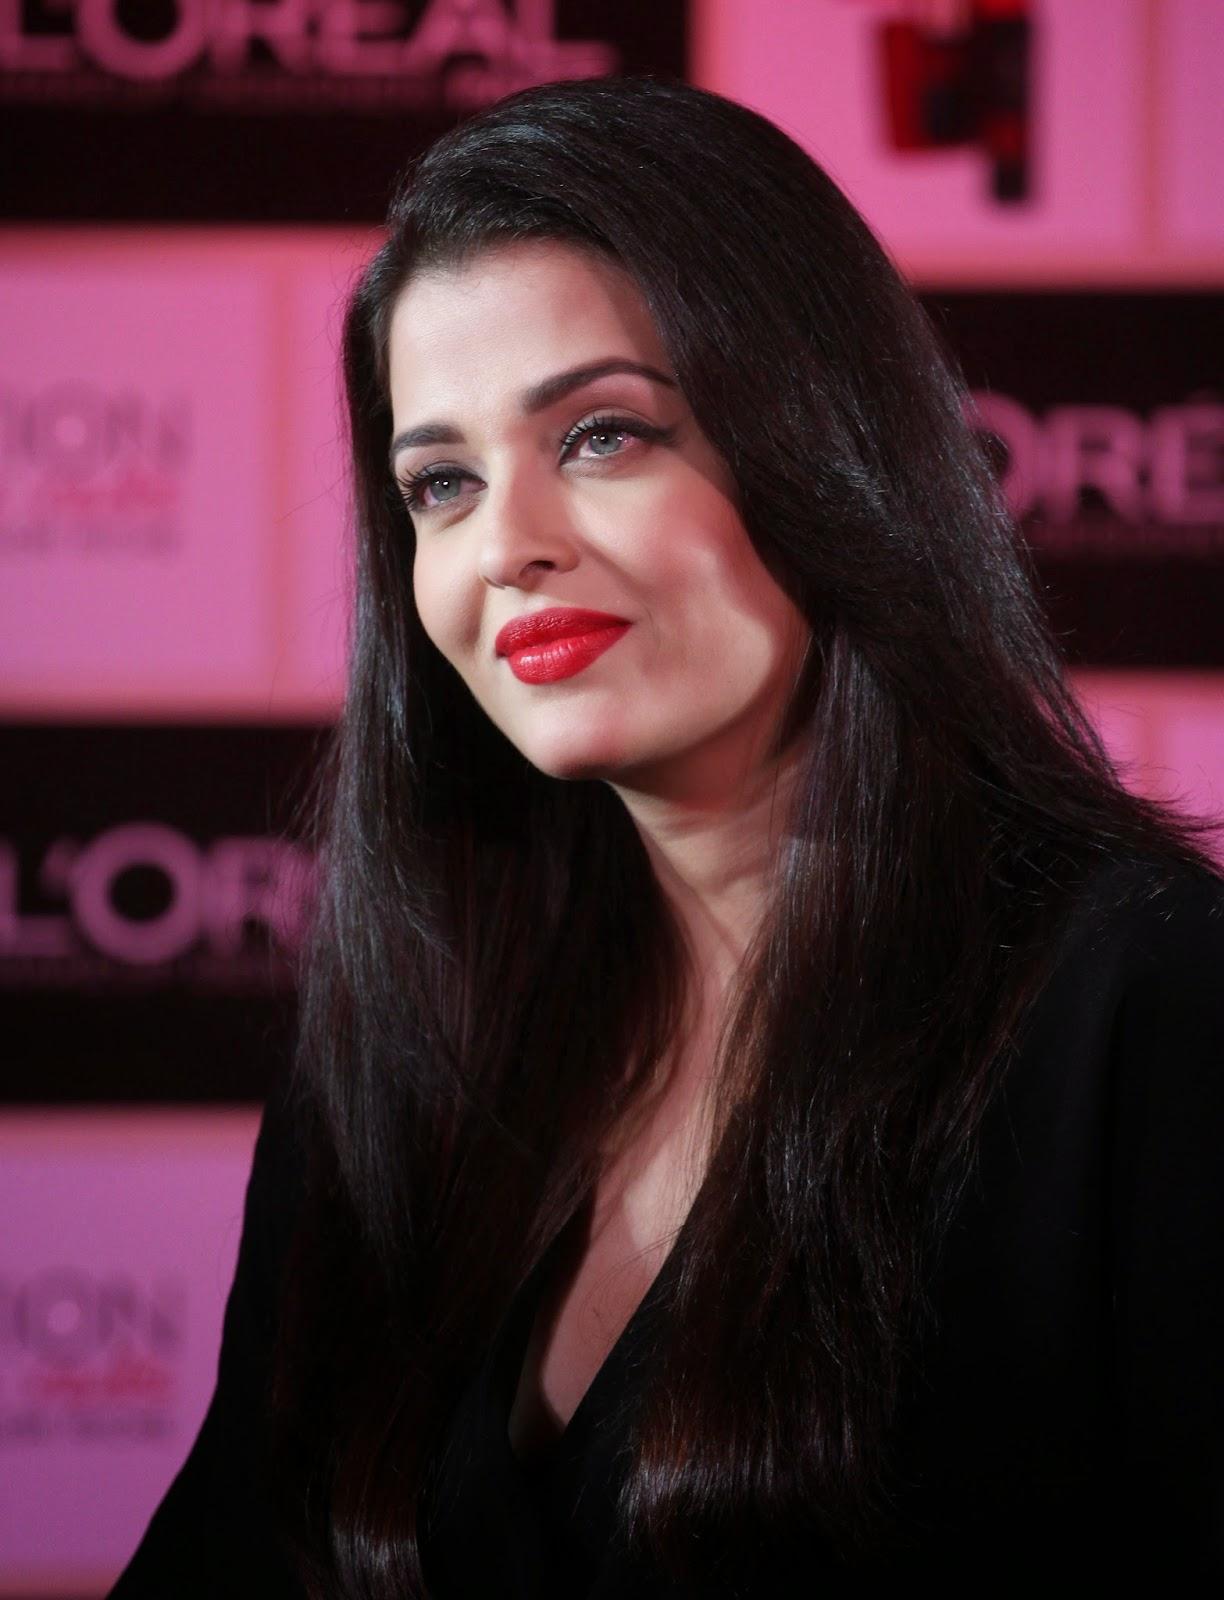 Aishwarya Rai Bachchan from L'oreal Pure Reds Lipsticks ...